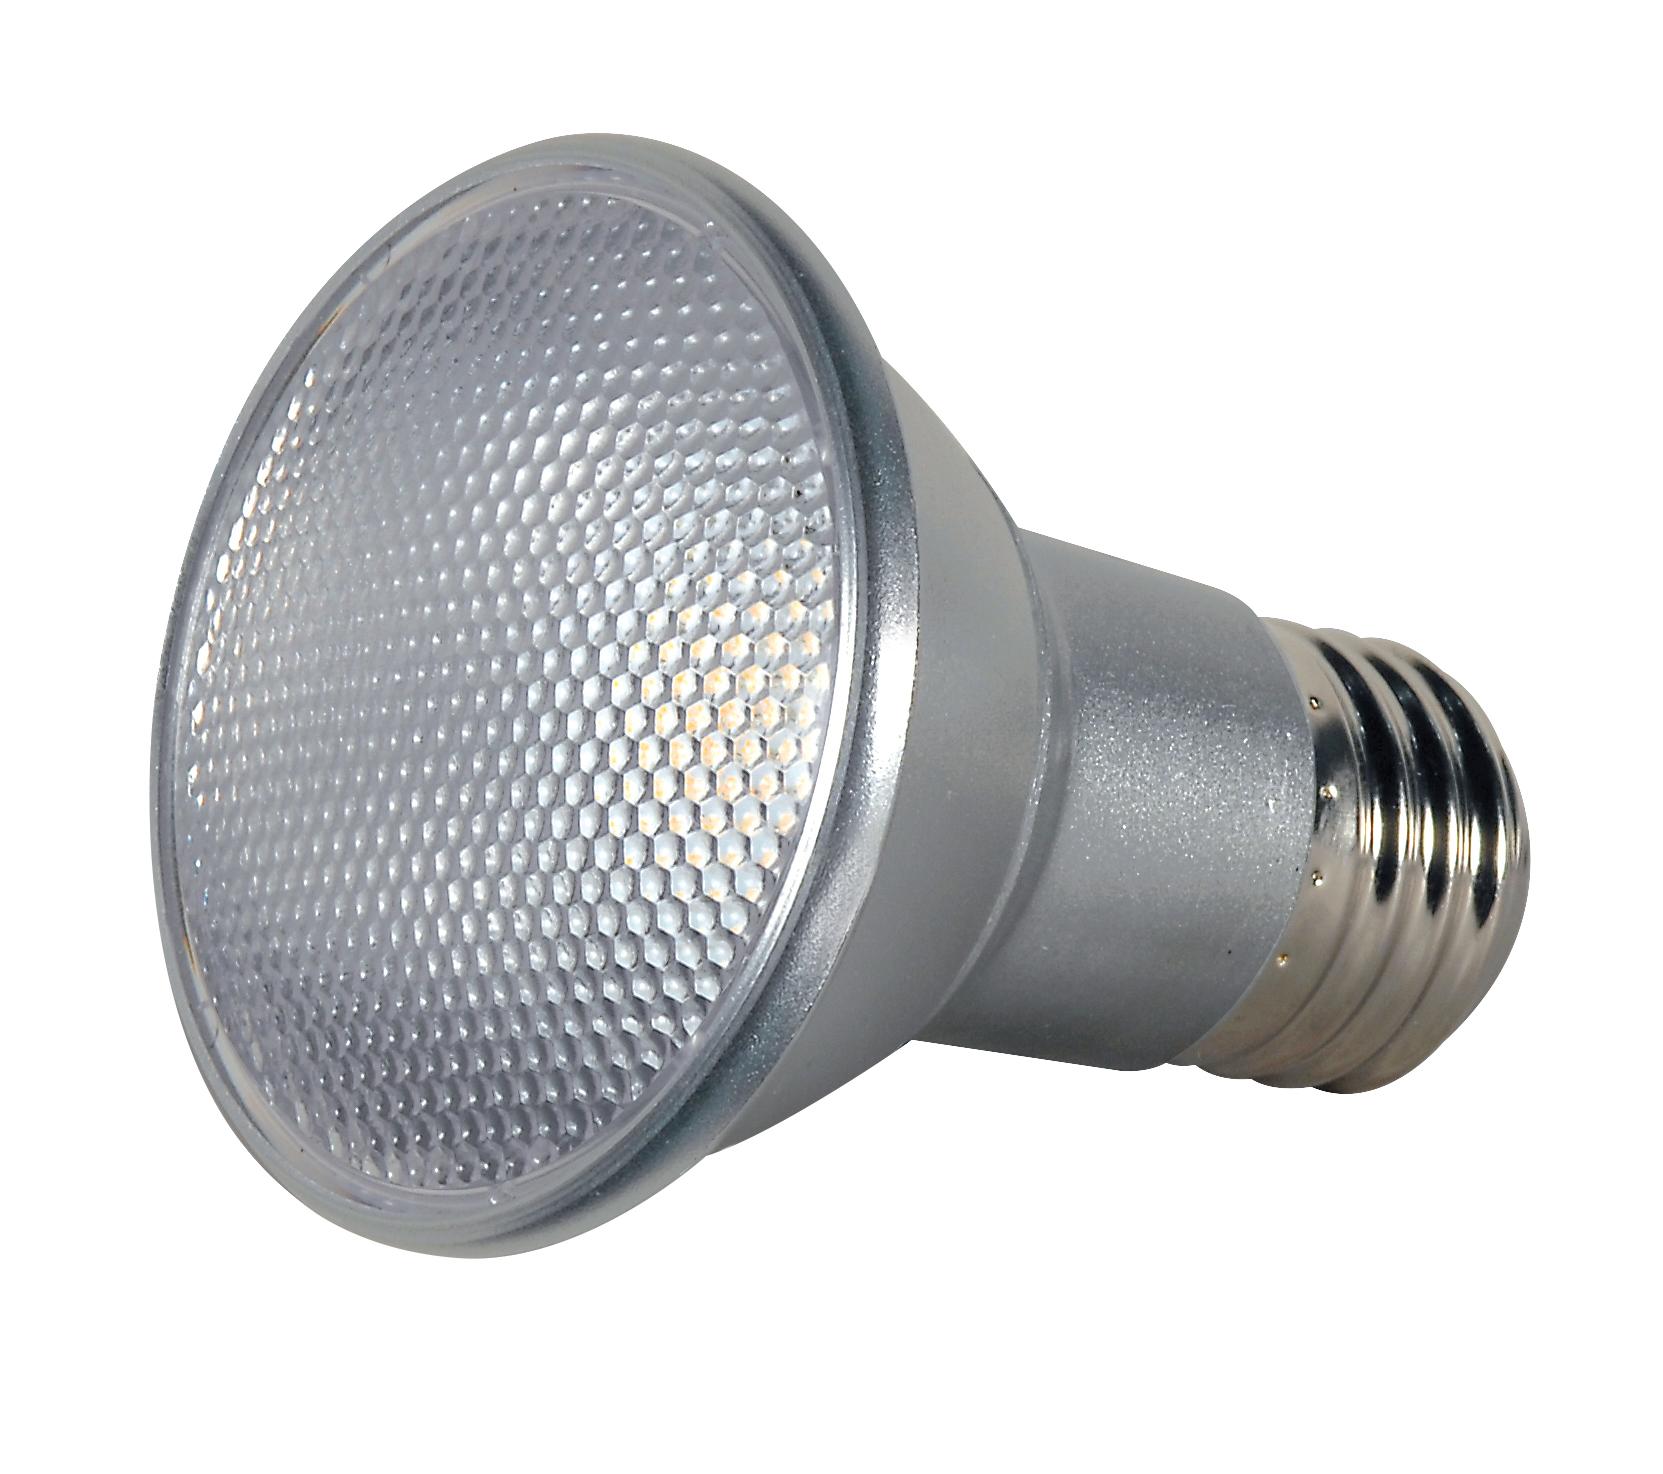 Satco,S9400,SATCO® S9400 Dimmable Reflective Lamp, 7 W, LED Lamp, Medium E26 Lamp Base, PAR20 Shape, 525 Lumens Initial